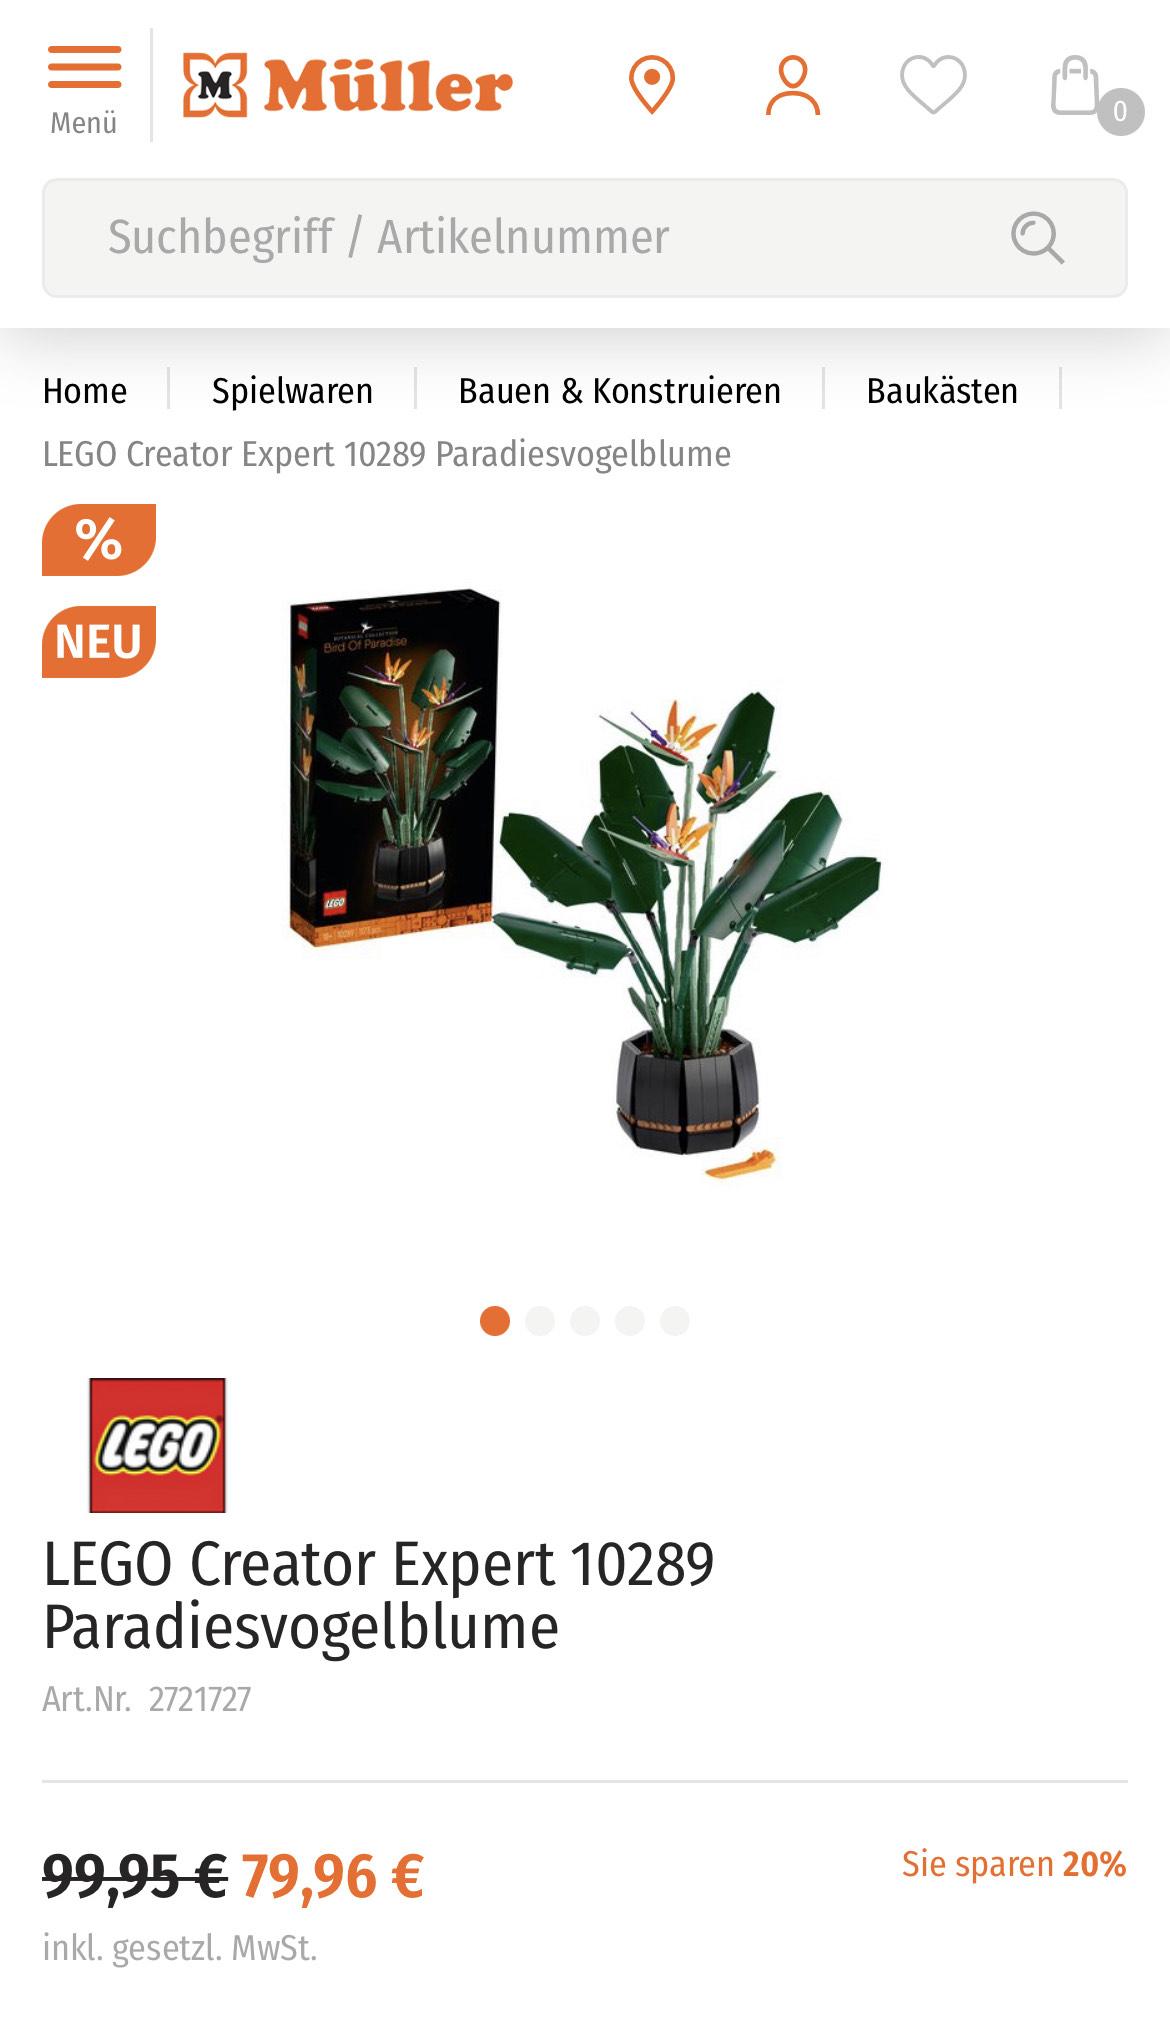 [Müller] LEGO Creator Expert 10289 Paradiesvogelblume mit knapp 20% Rabatt Evtl. mehr